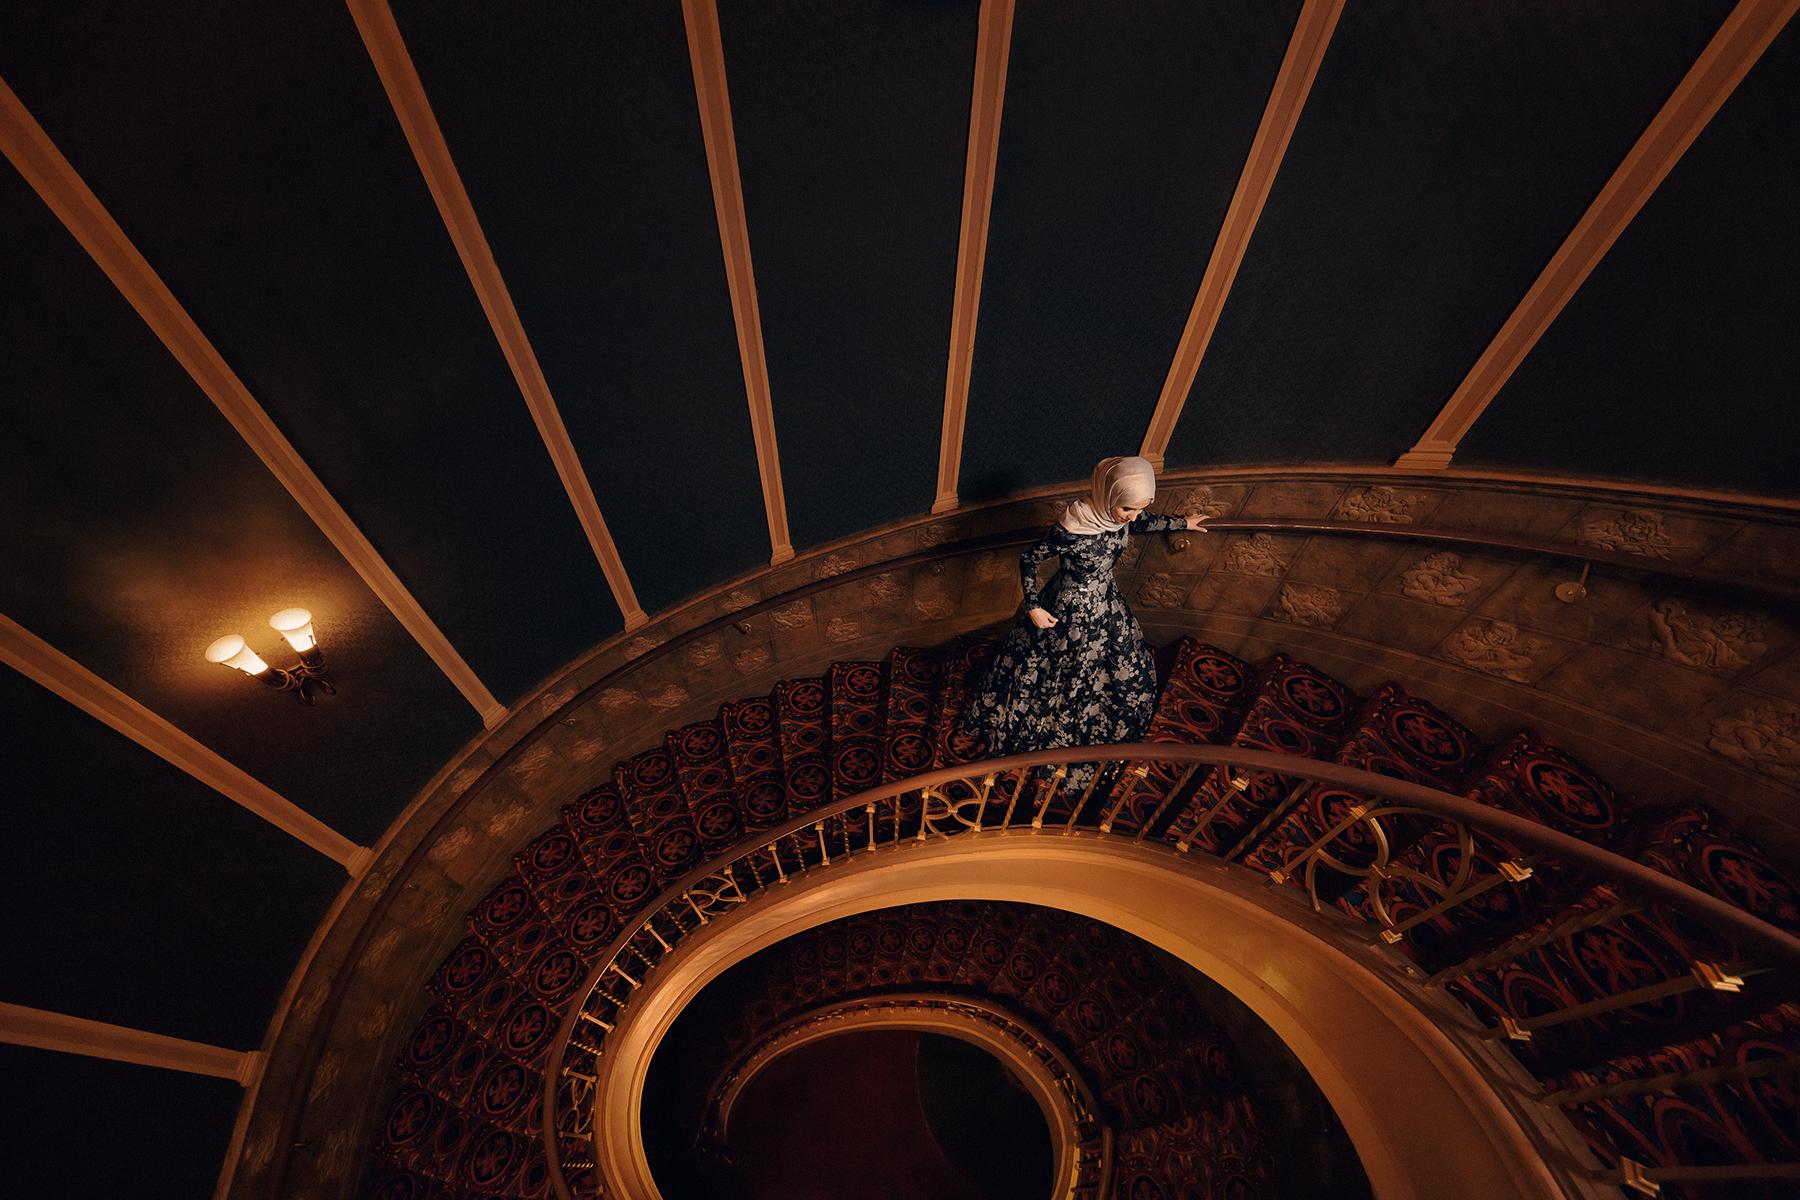 Phoenix Orpheum theater